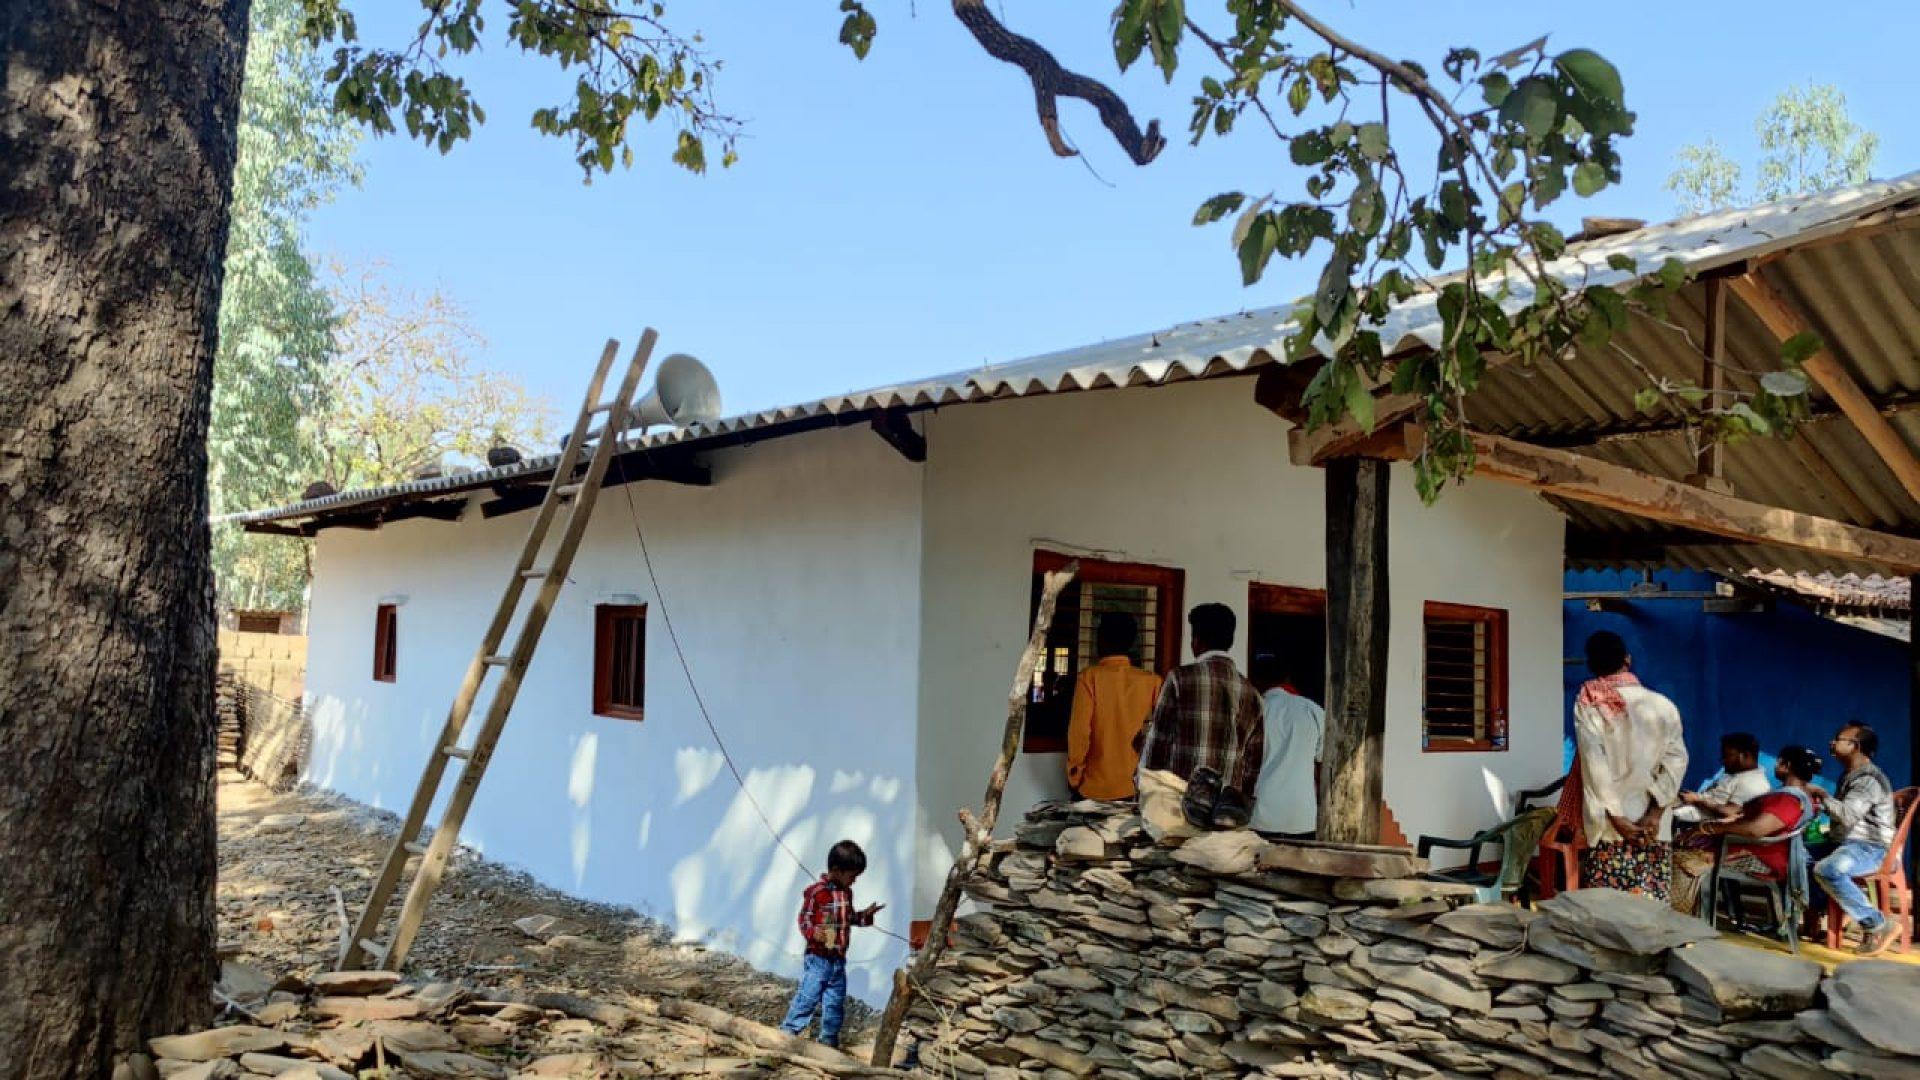 New Village Church Self-built